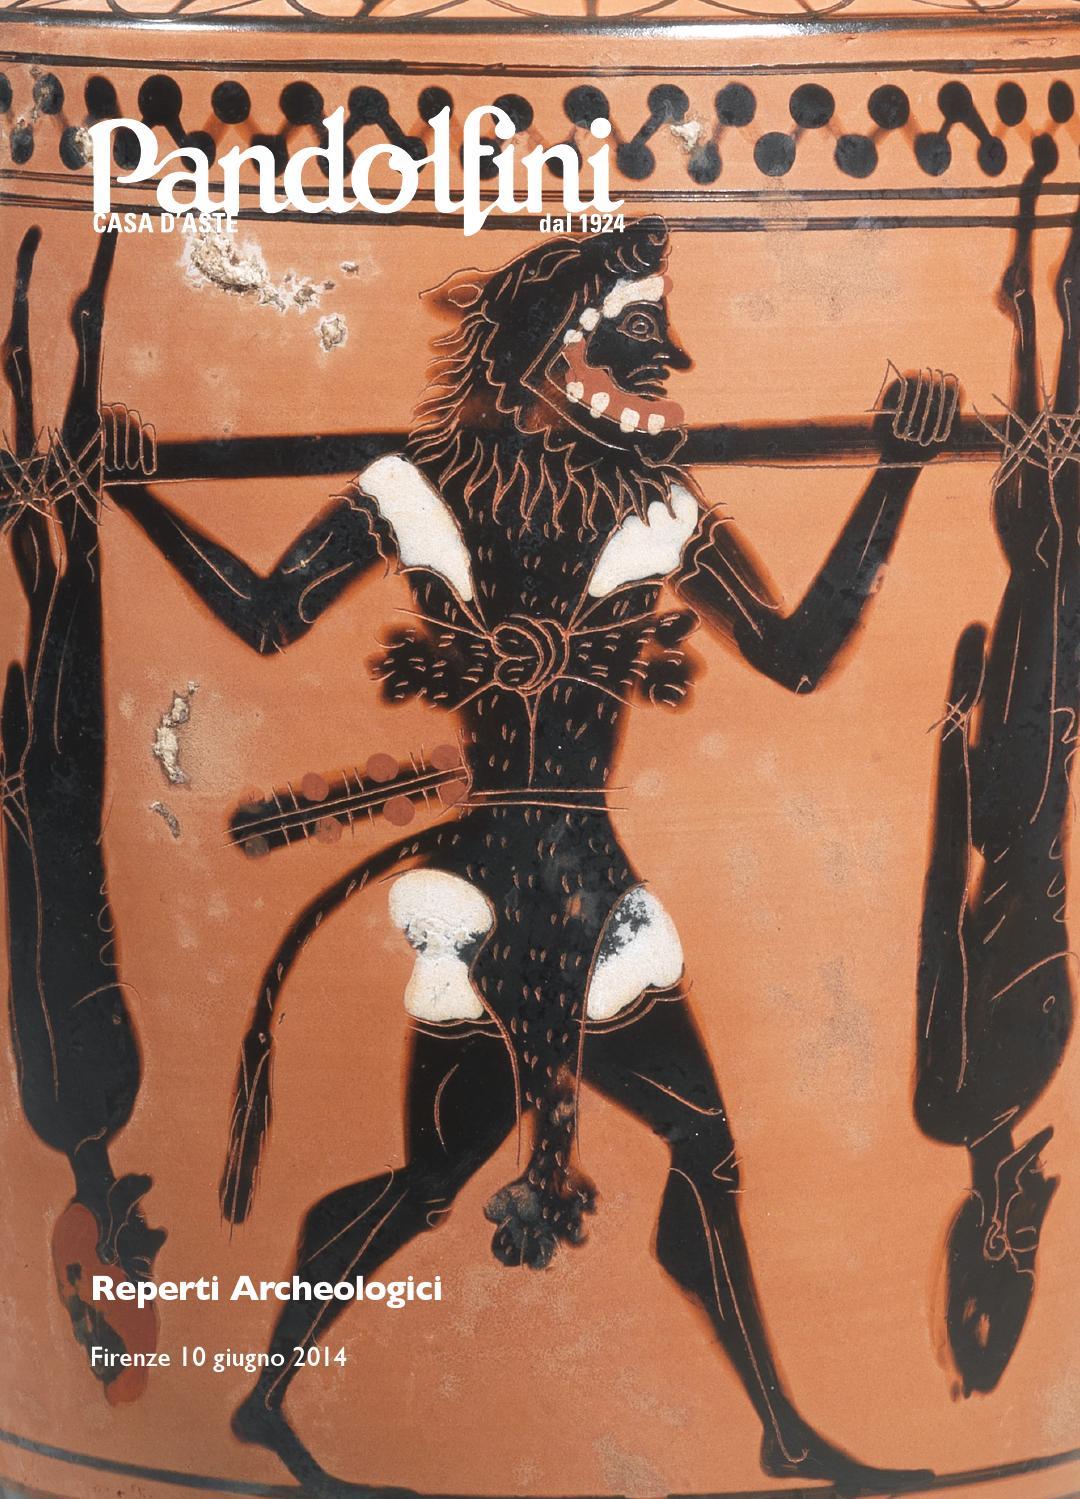 Reperti archeologici by pandolfini casa d'aste   issuu